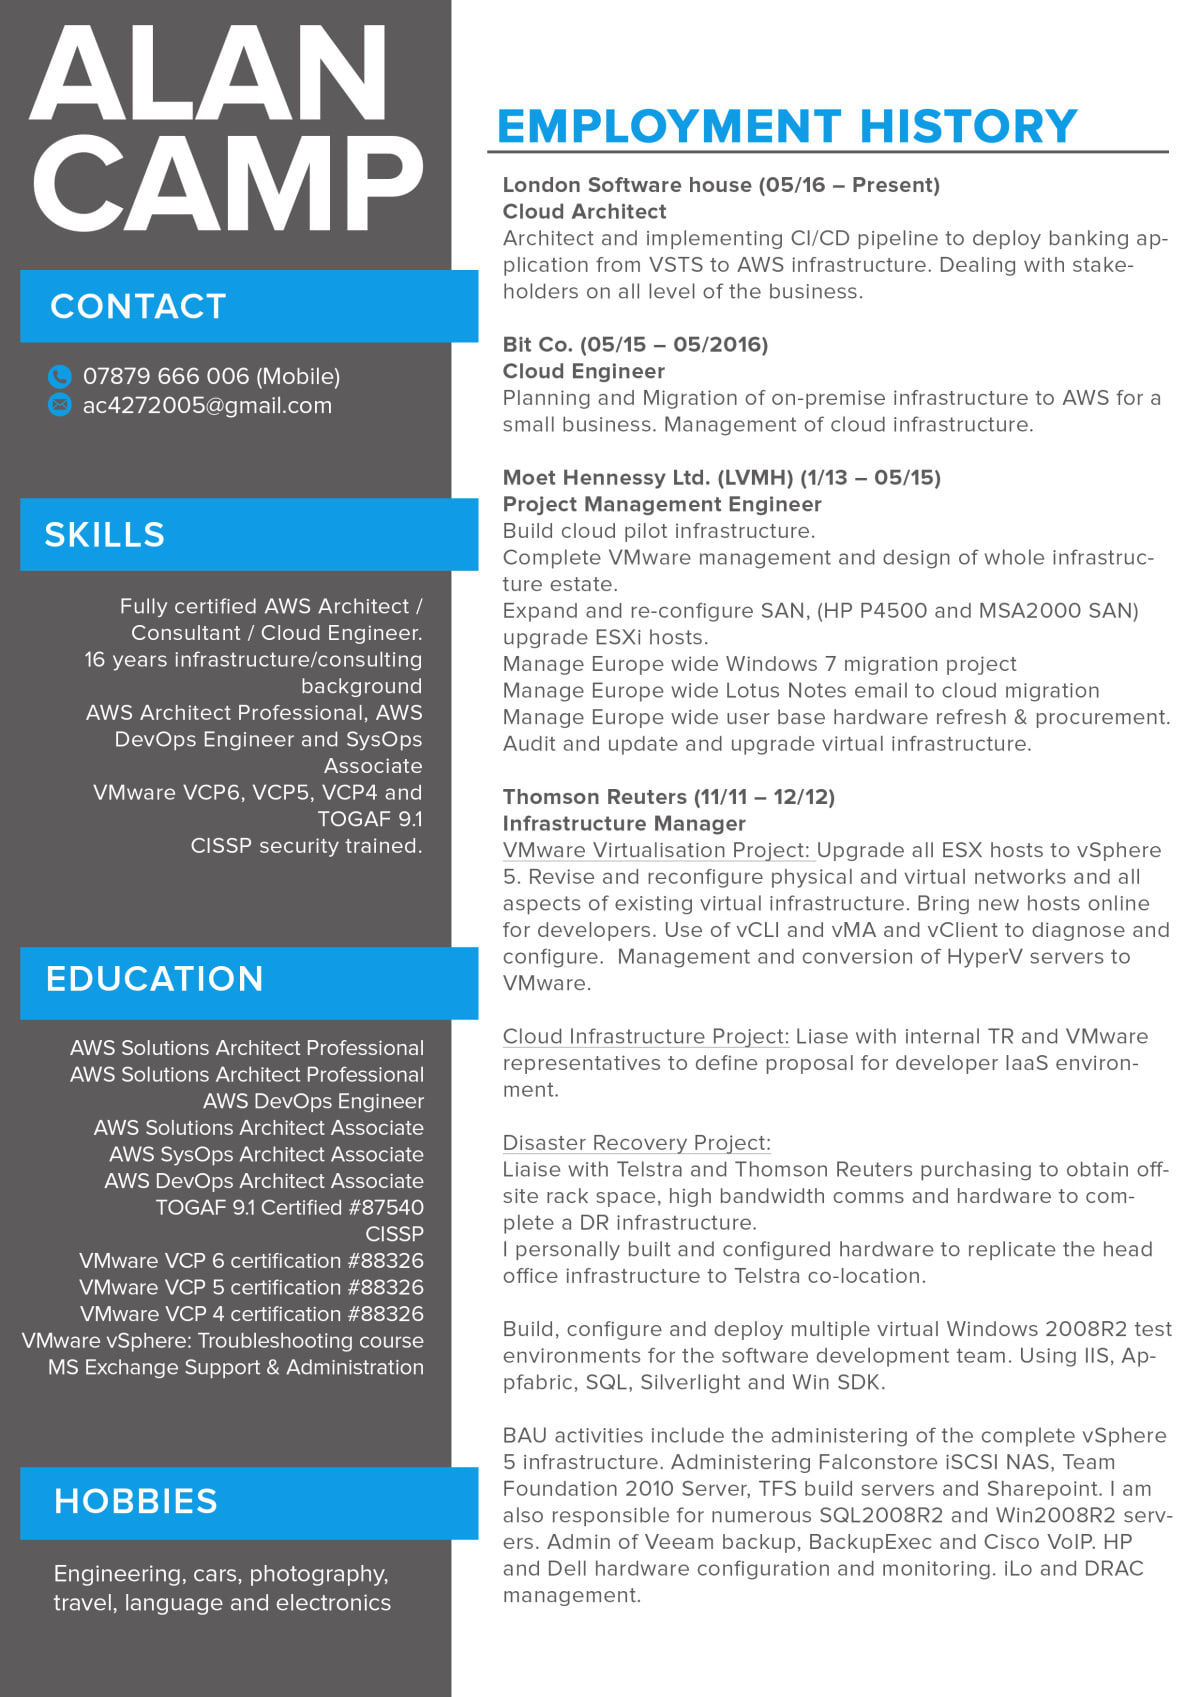 Design resume, cv, cover letter by Fiverrstar